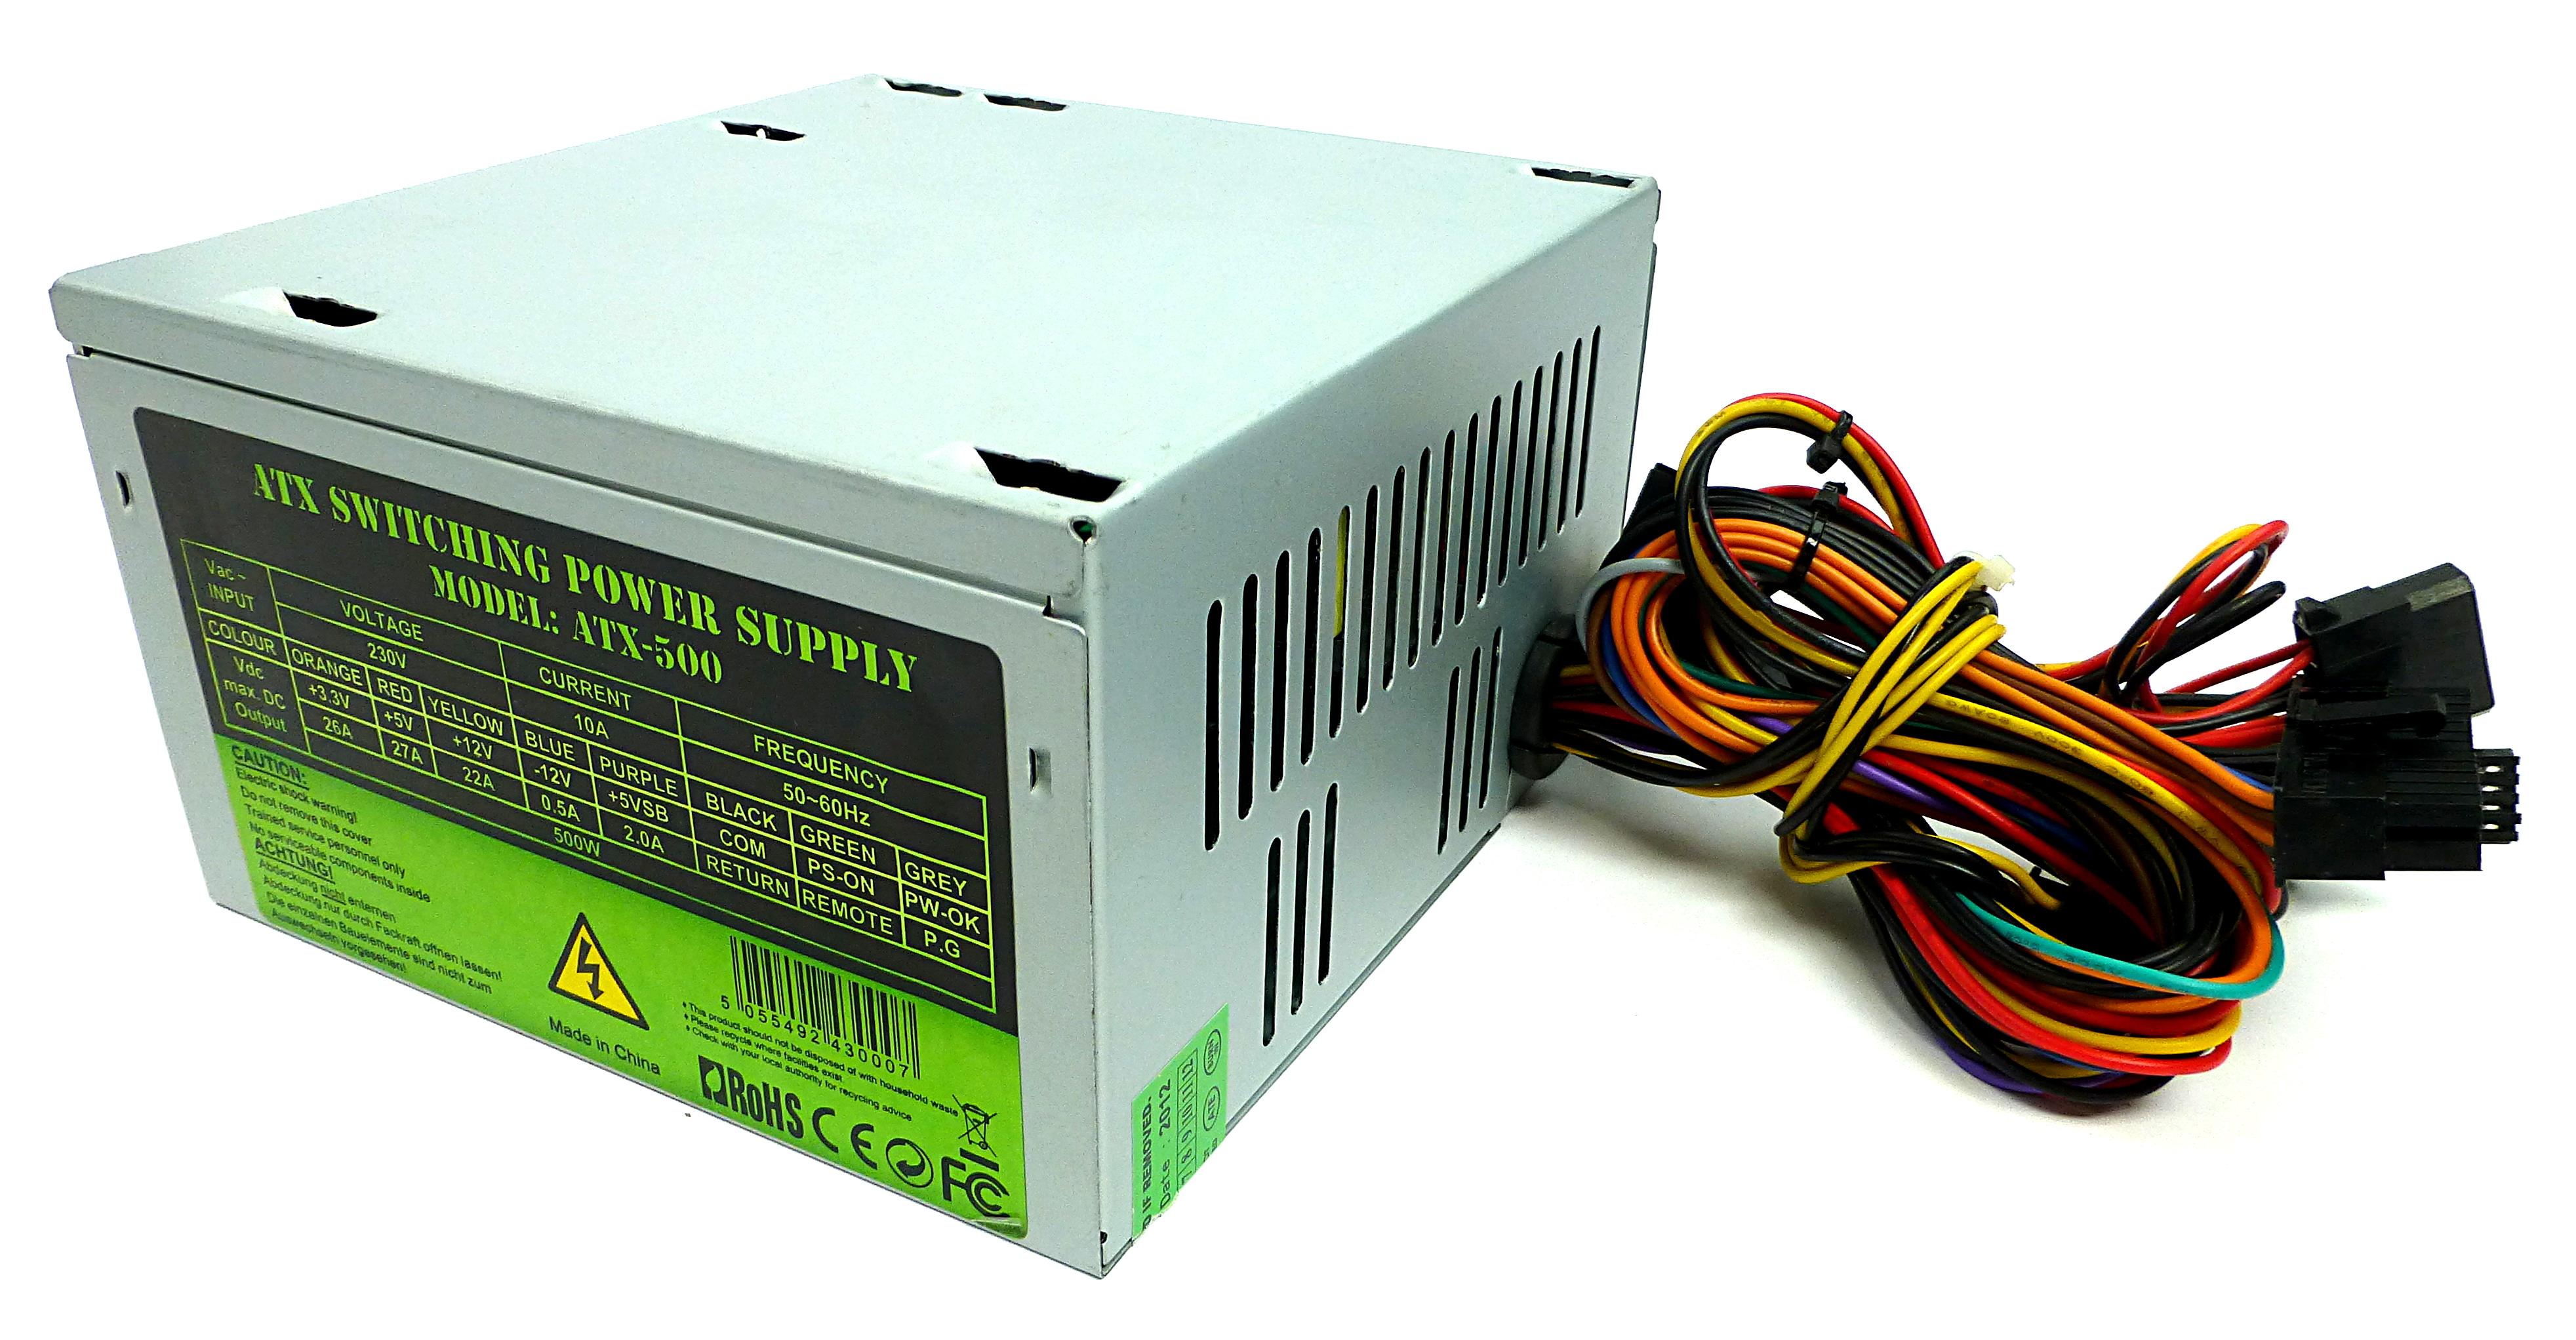 ATX-500 500W 20-24pin ATX Power Supply